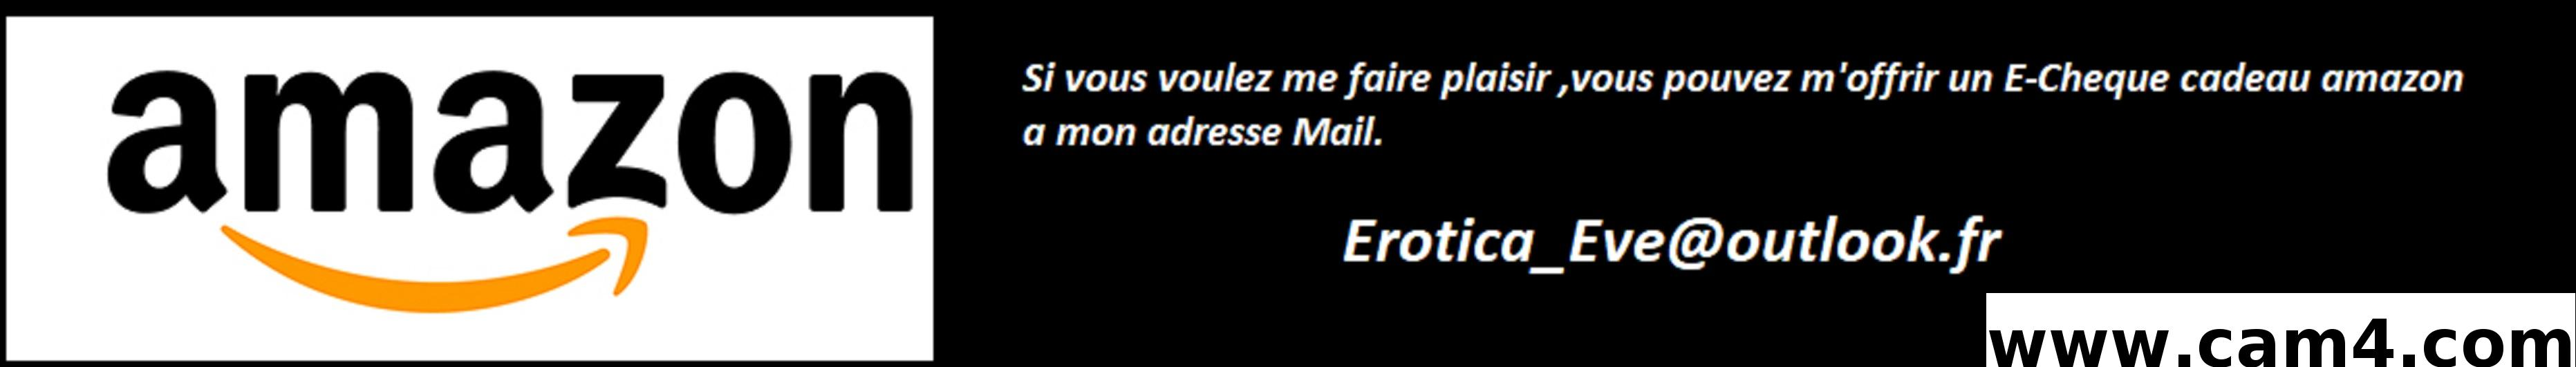 Erotica eve?s=1x1ml3rlvm+x+k30wj3rhbtvb15d20dvxjrxr+27pxs=